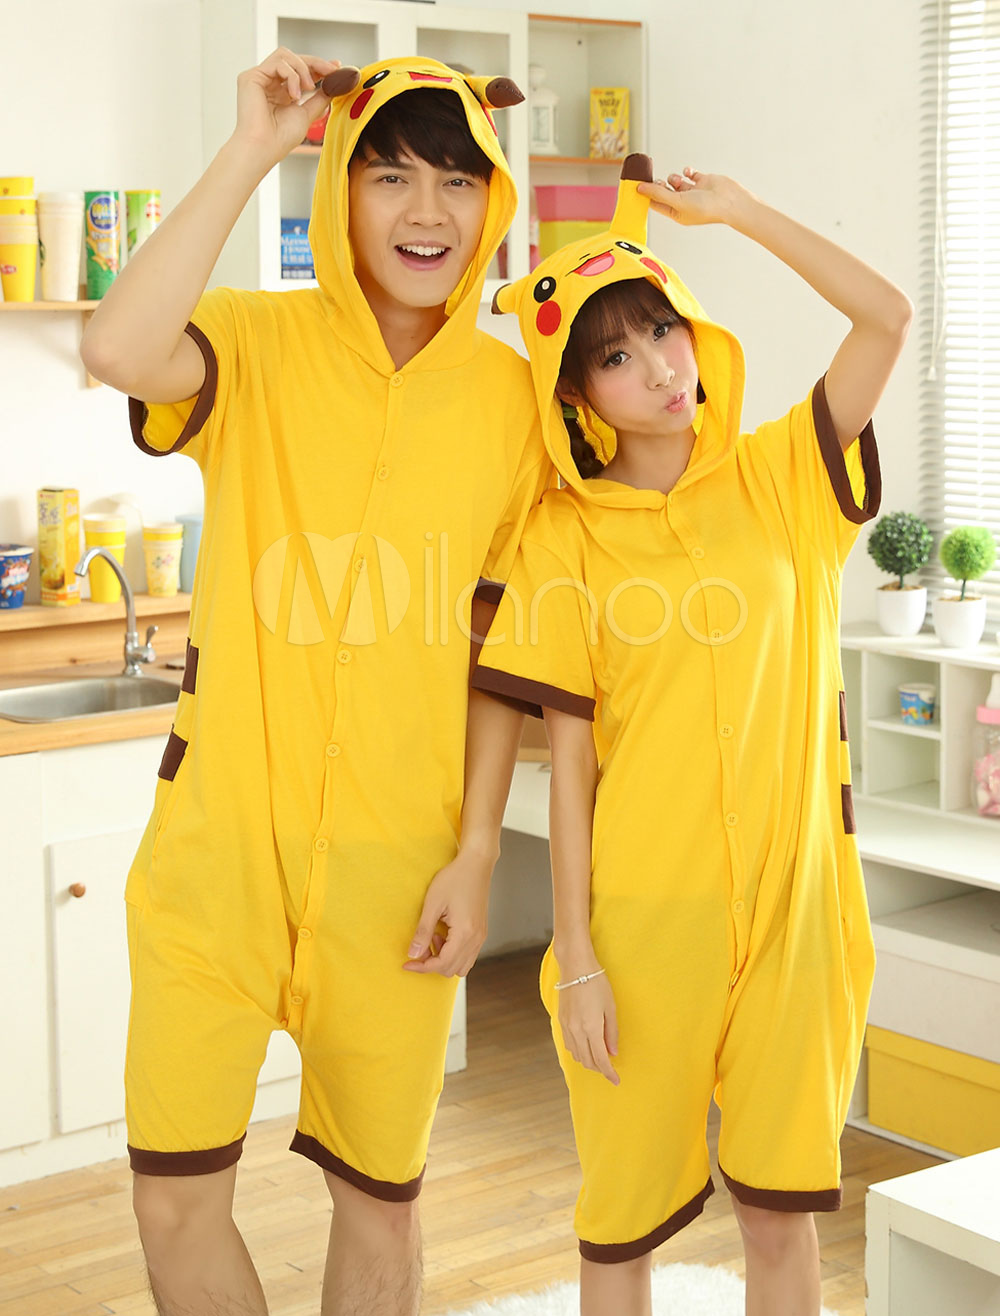 572e24c1379 Kigurumi Costumes · Kigurumi Adult · Kigurumi Pajama Pokemon Pikachu Onesie  Yellow Cotton Short Sleeve Anime Sleepwear For Adult Halloween-No ...